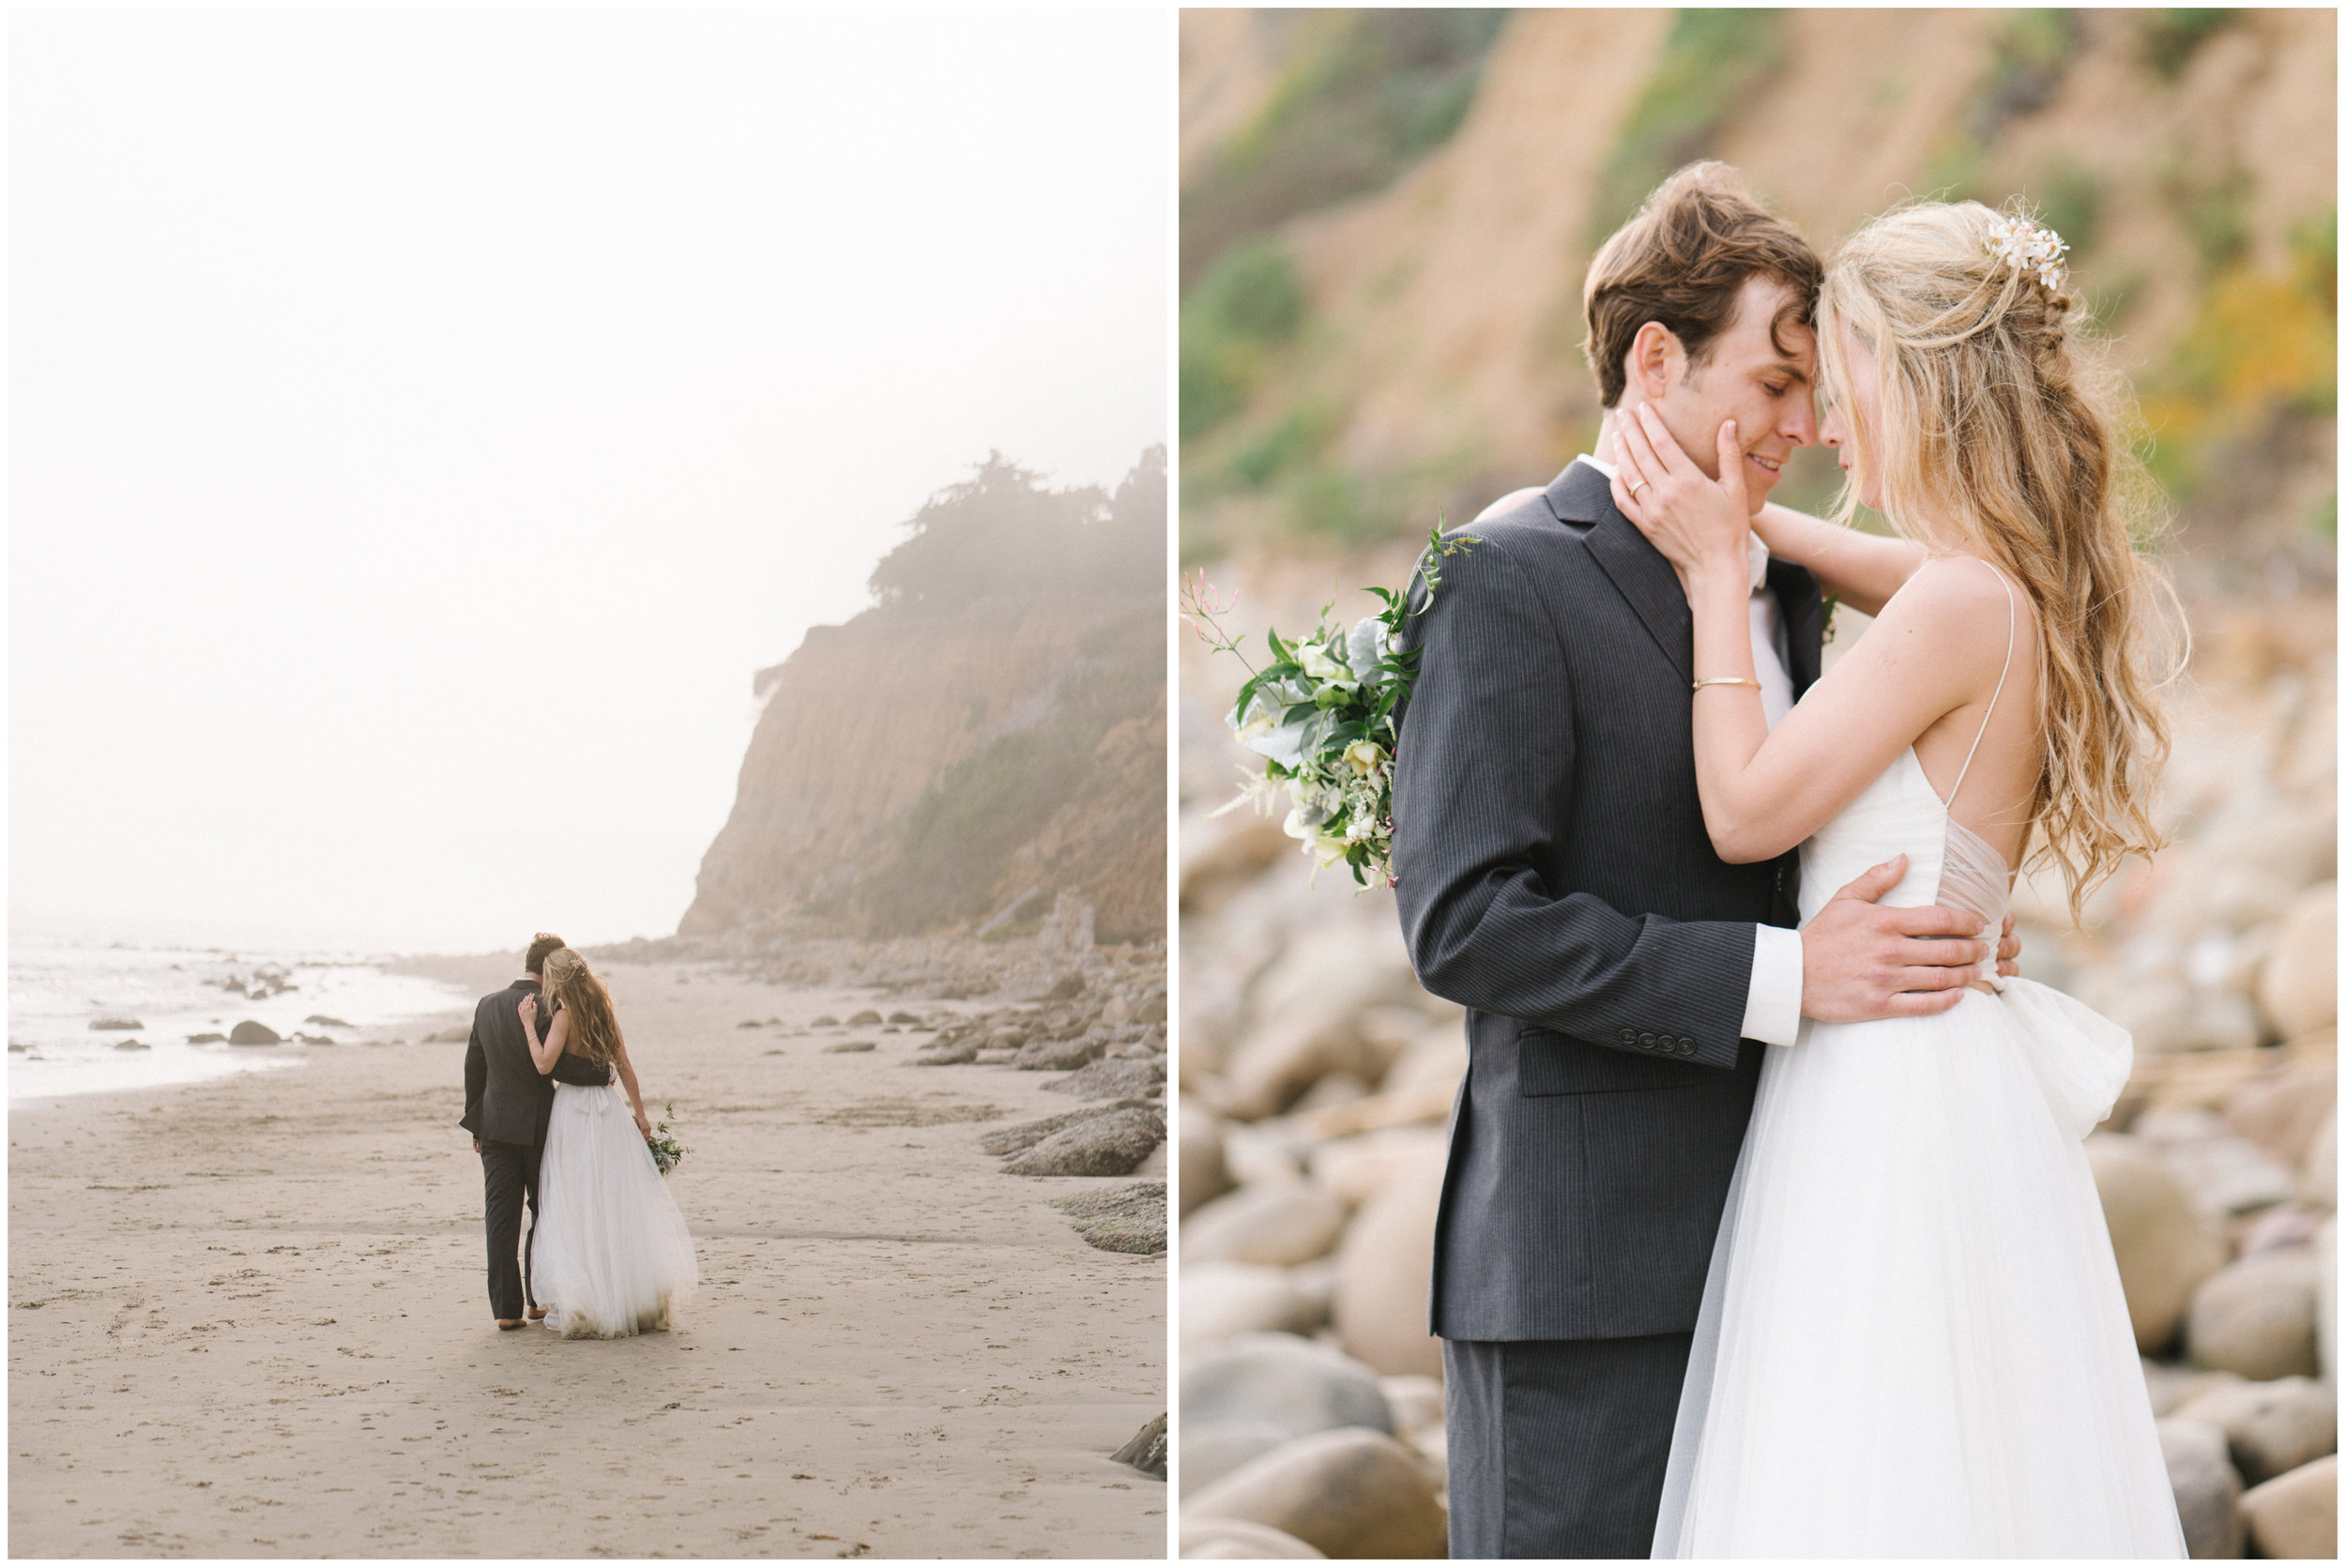 Santa Barbara Elopement Wedding Photographer - Pinnel Photography-13.jpg